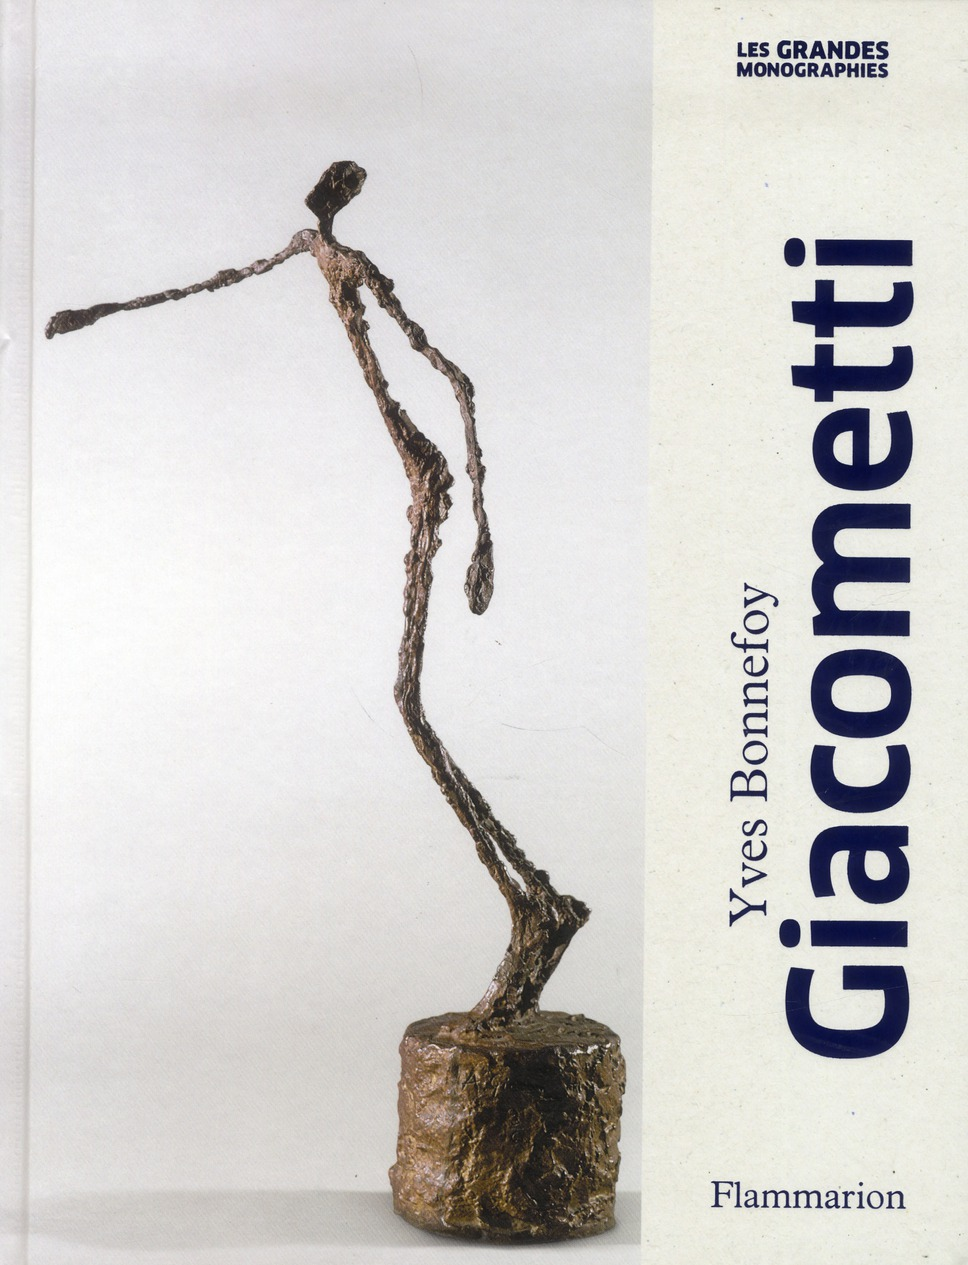 BONNEFOY, YVES - ALBERTO GIACOMETTI